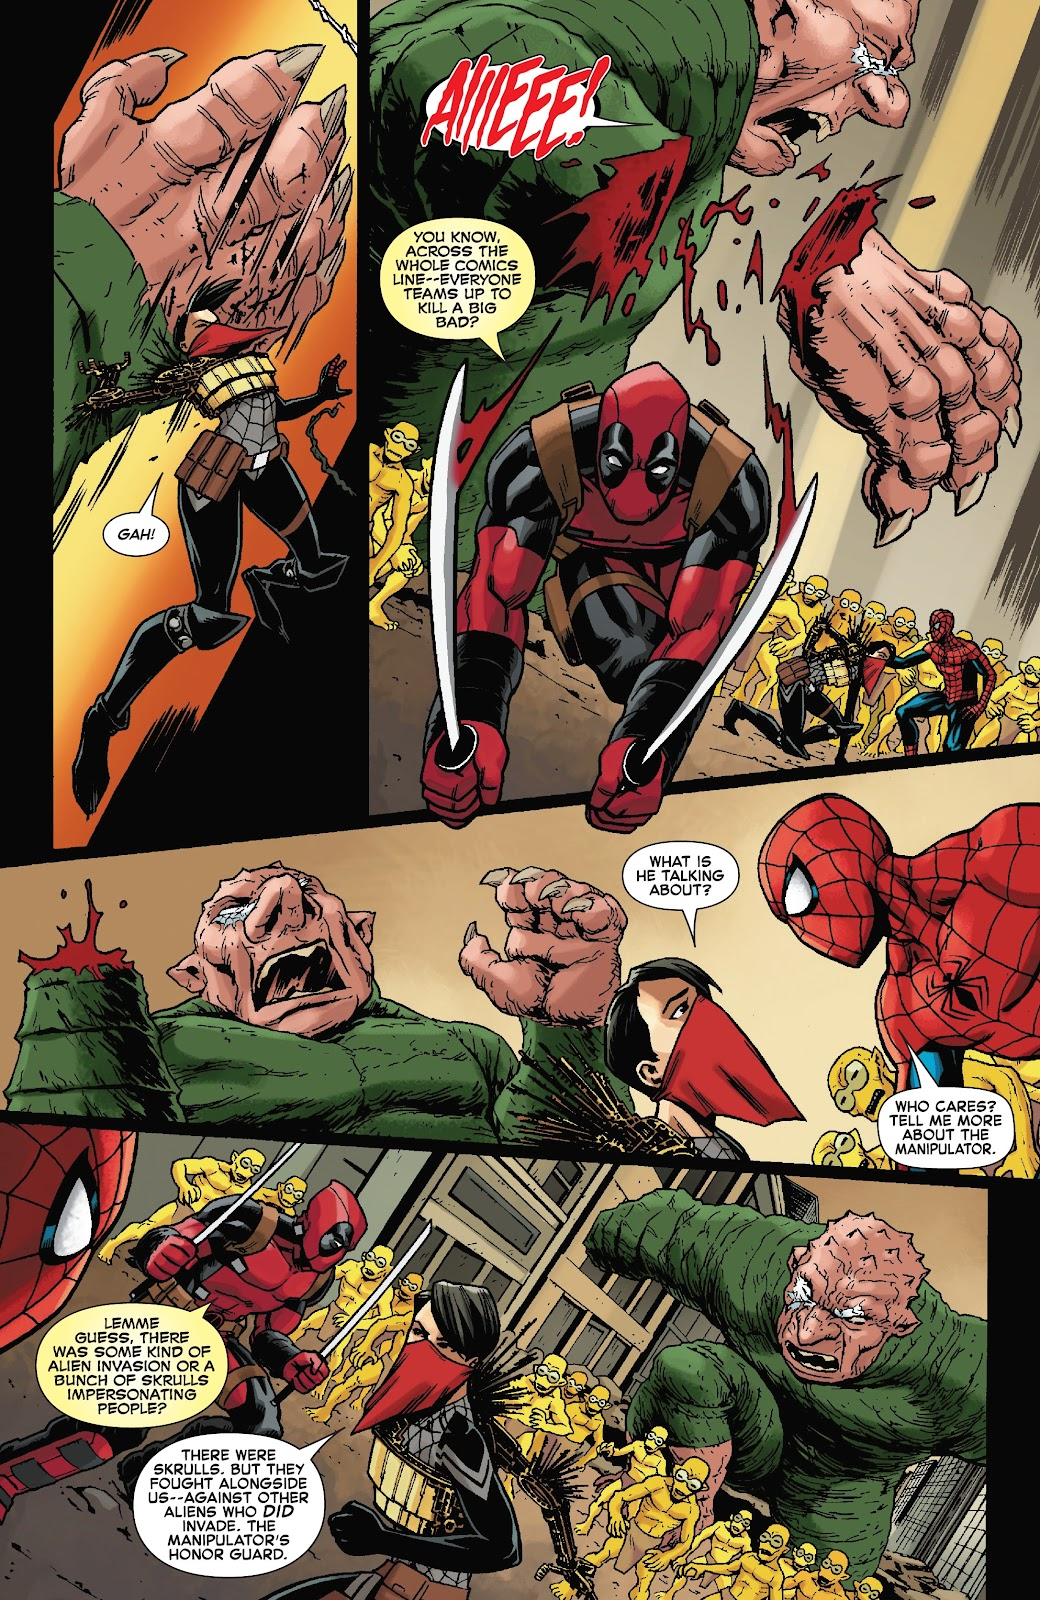 Read online Spider-Man/Deadpool comic -  Issue #46 - 16